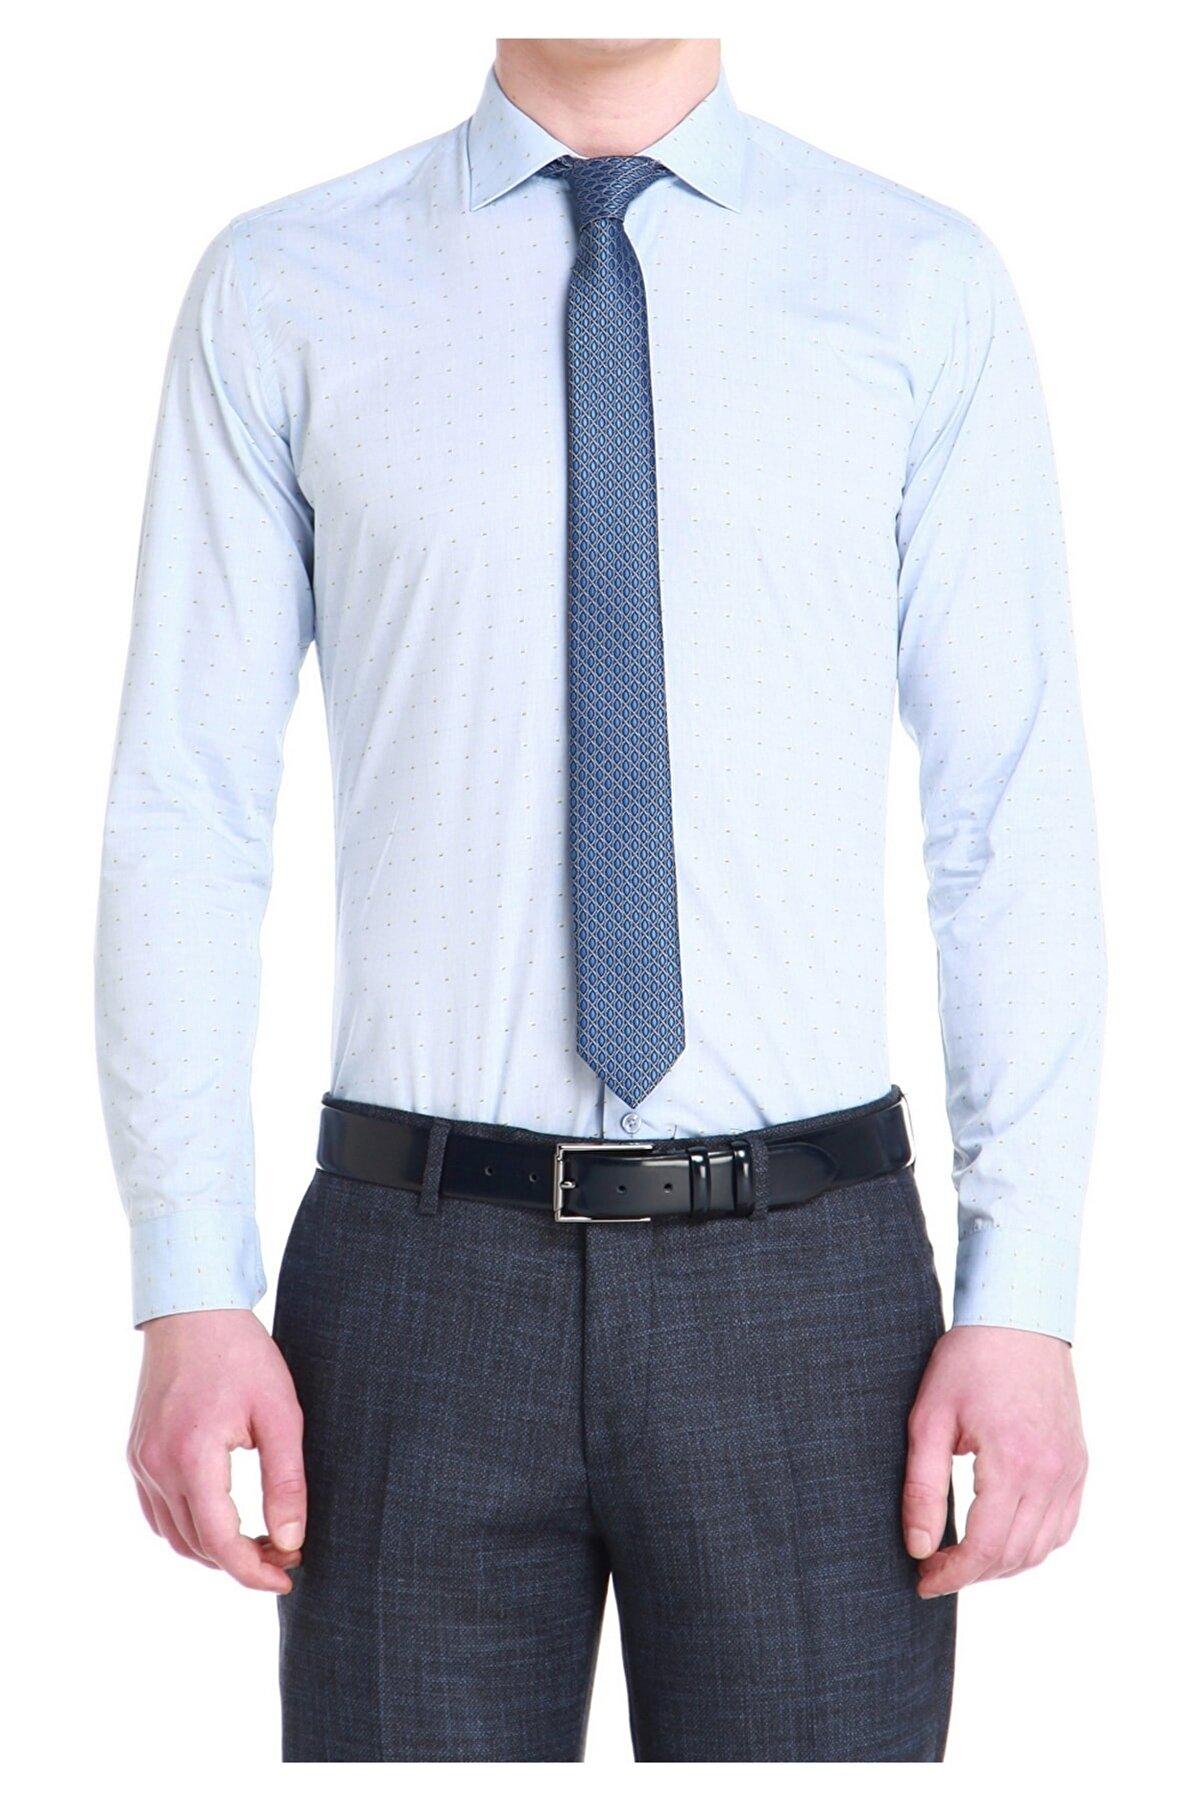 Efor Gk 531 Slim Fit Açık Mavi Klasik Gömlek